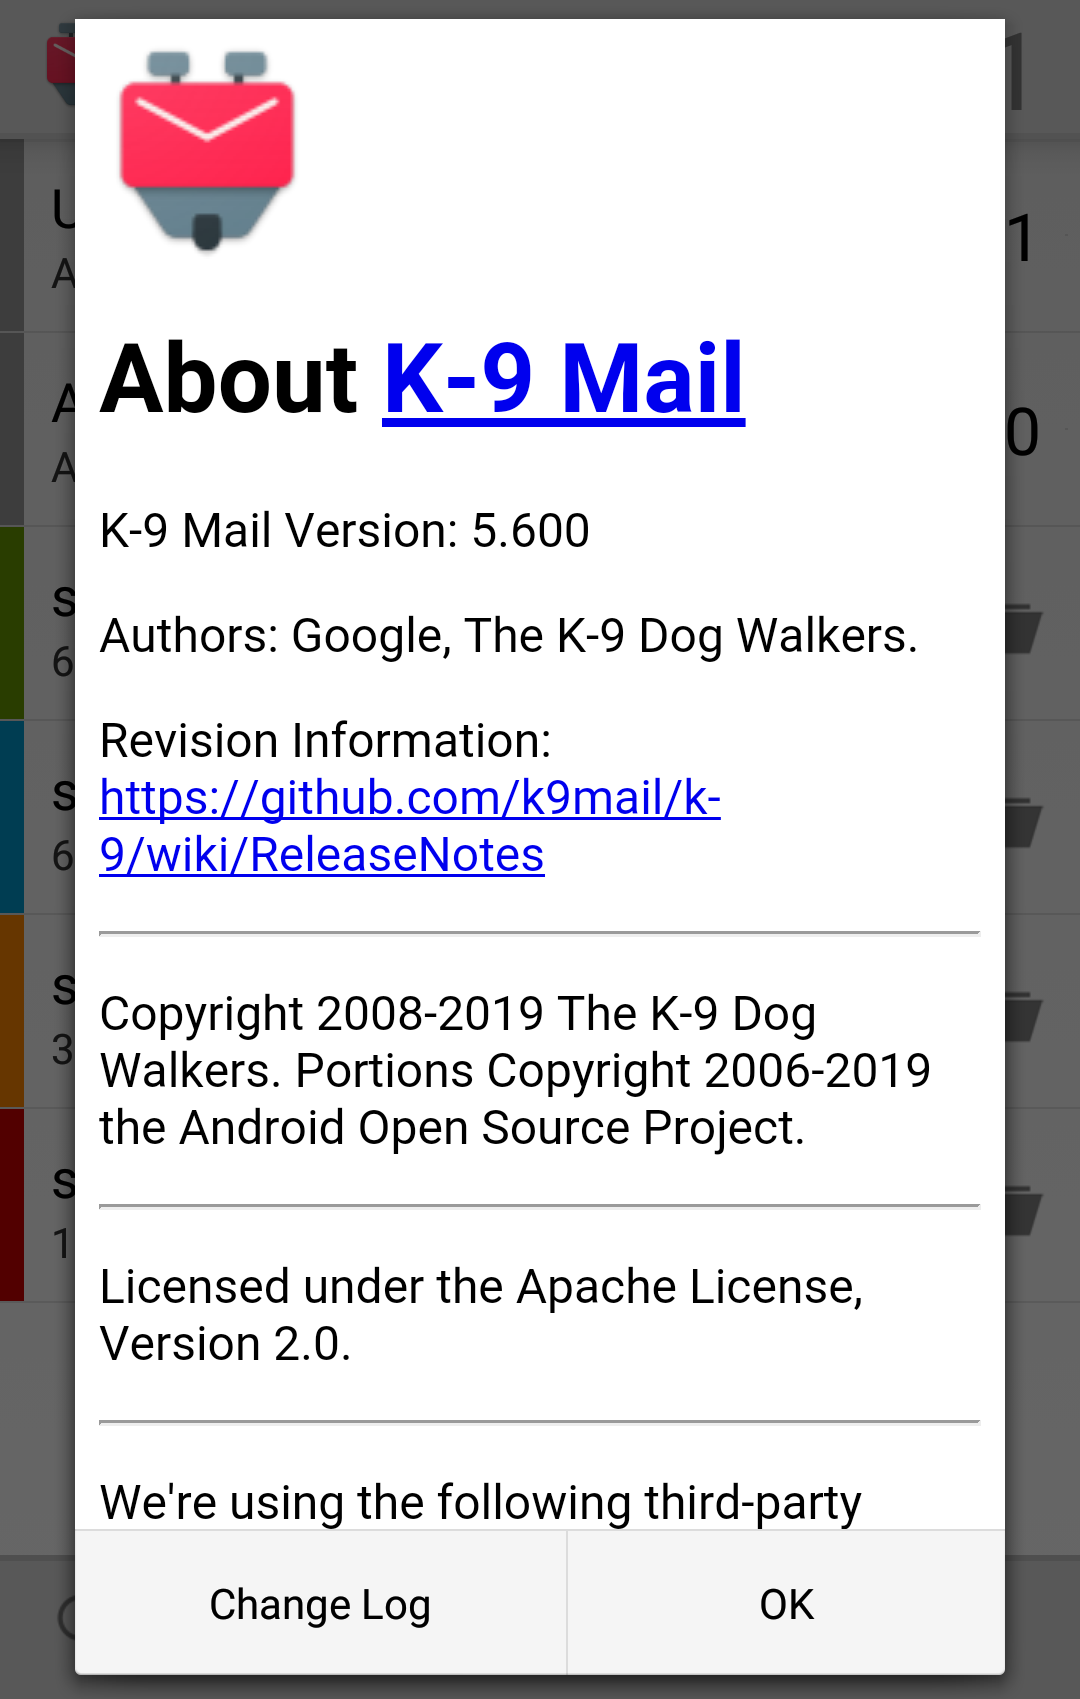 k9mail ( K-9 Mail )